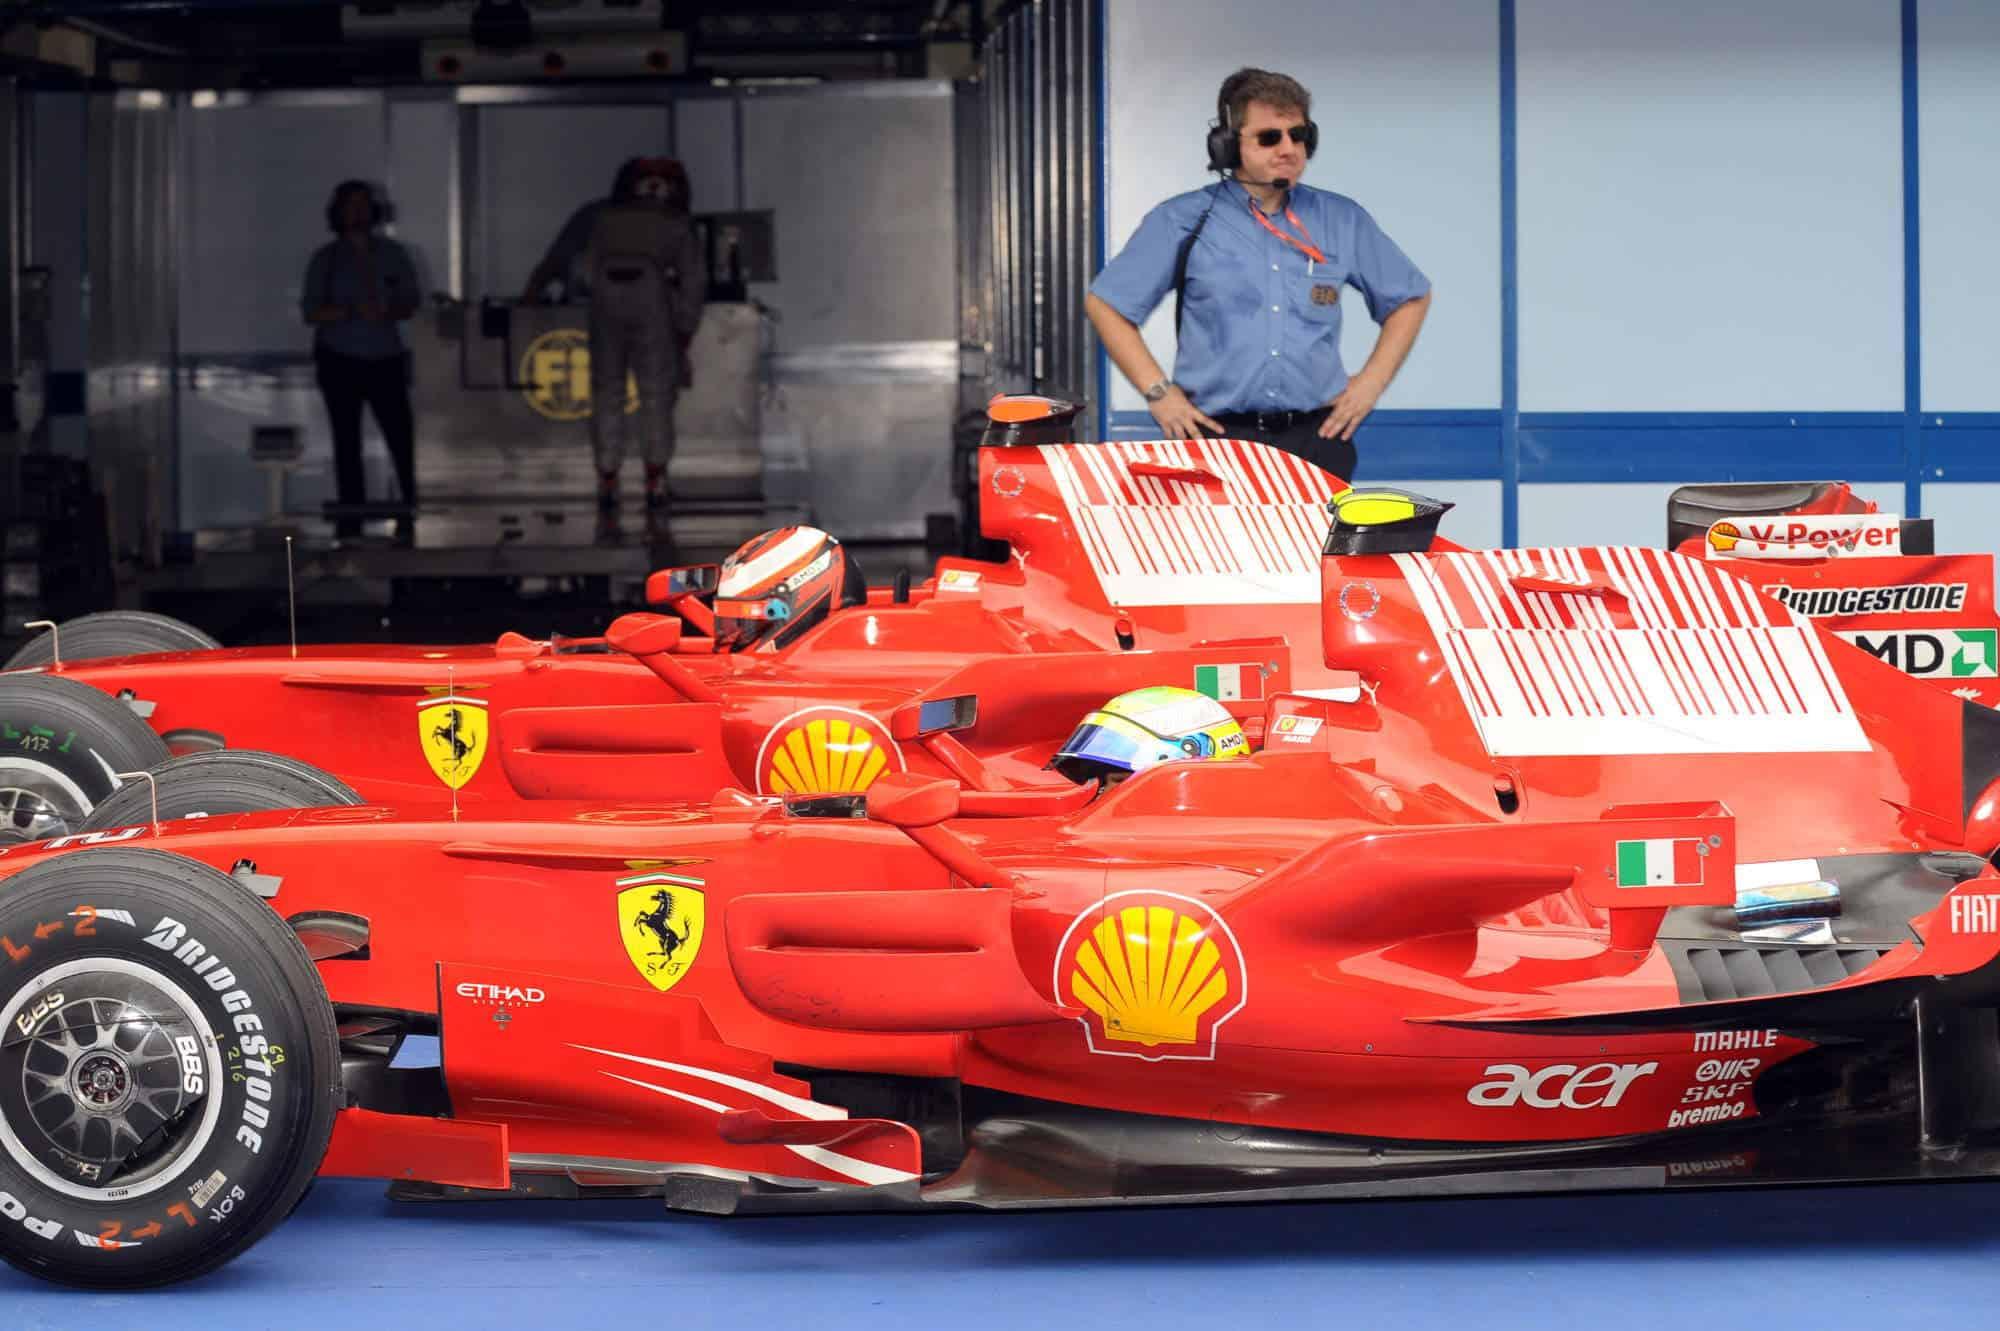 2008 Malaysian GP Massa Raikkonen after qualifying Photo Ferrari